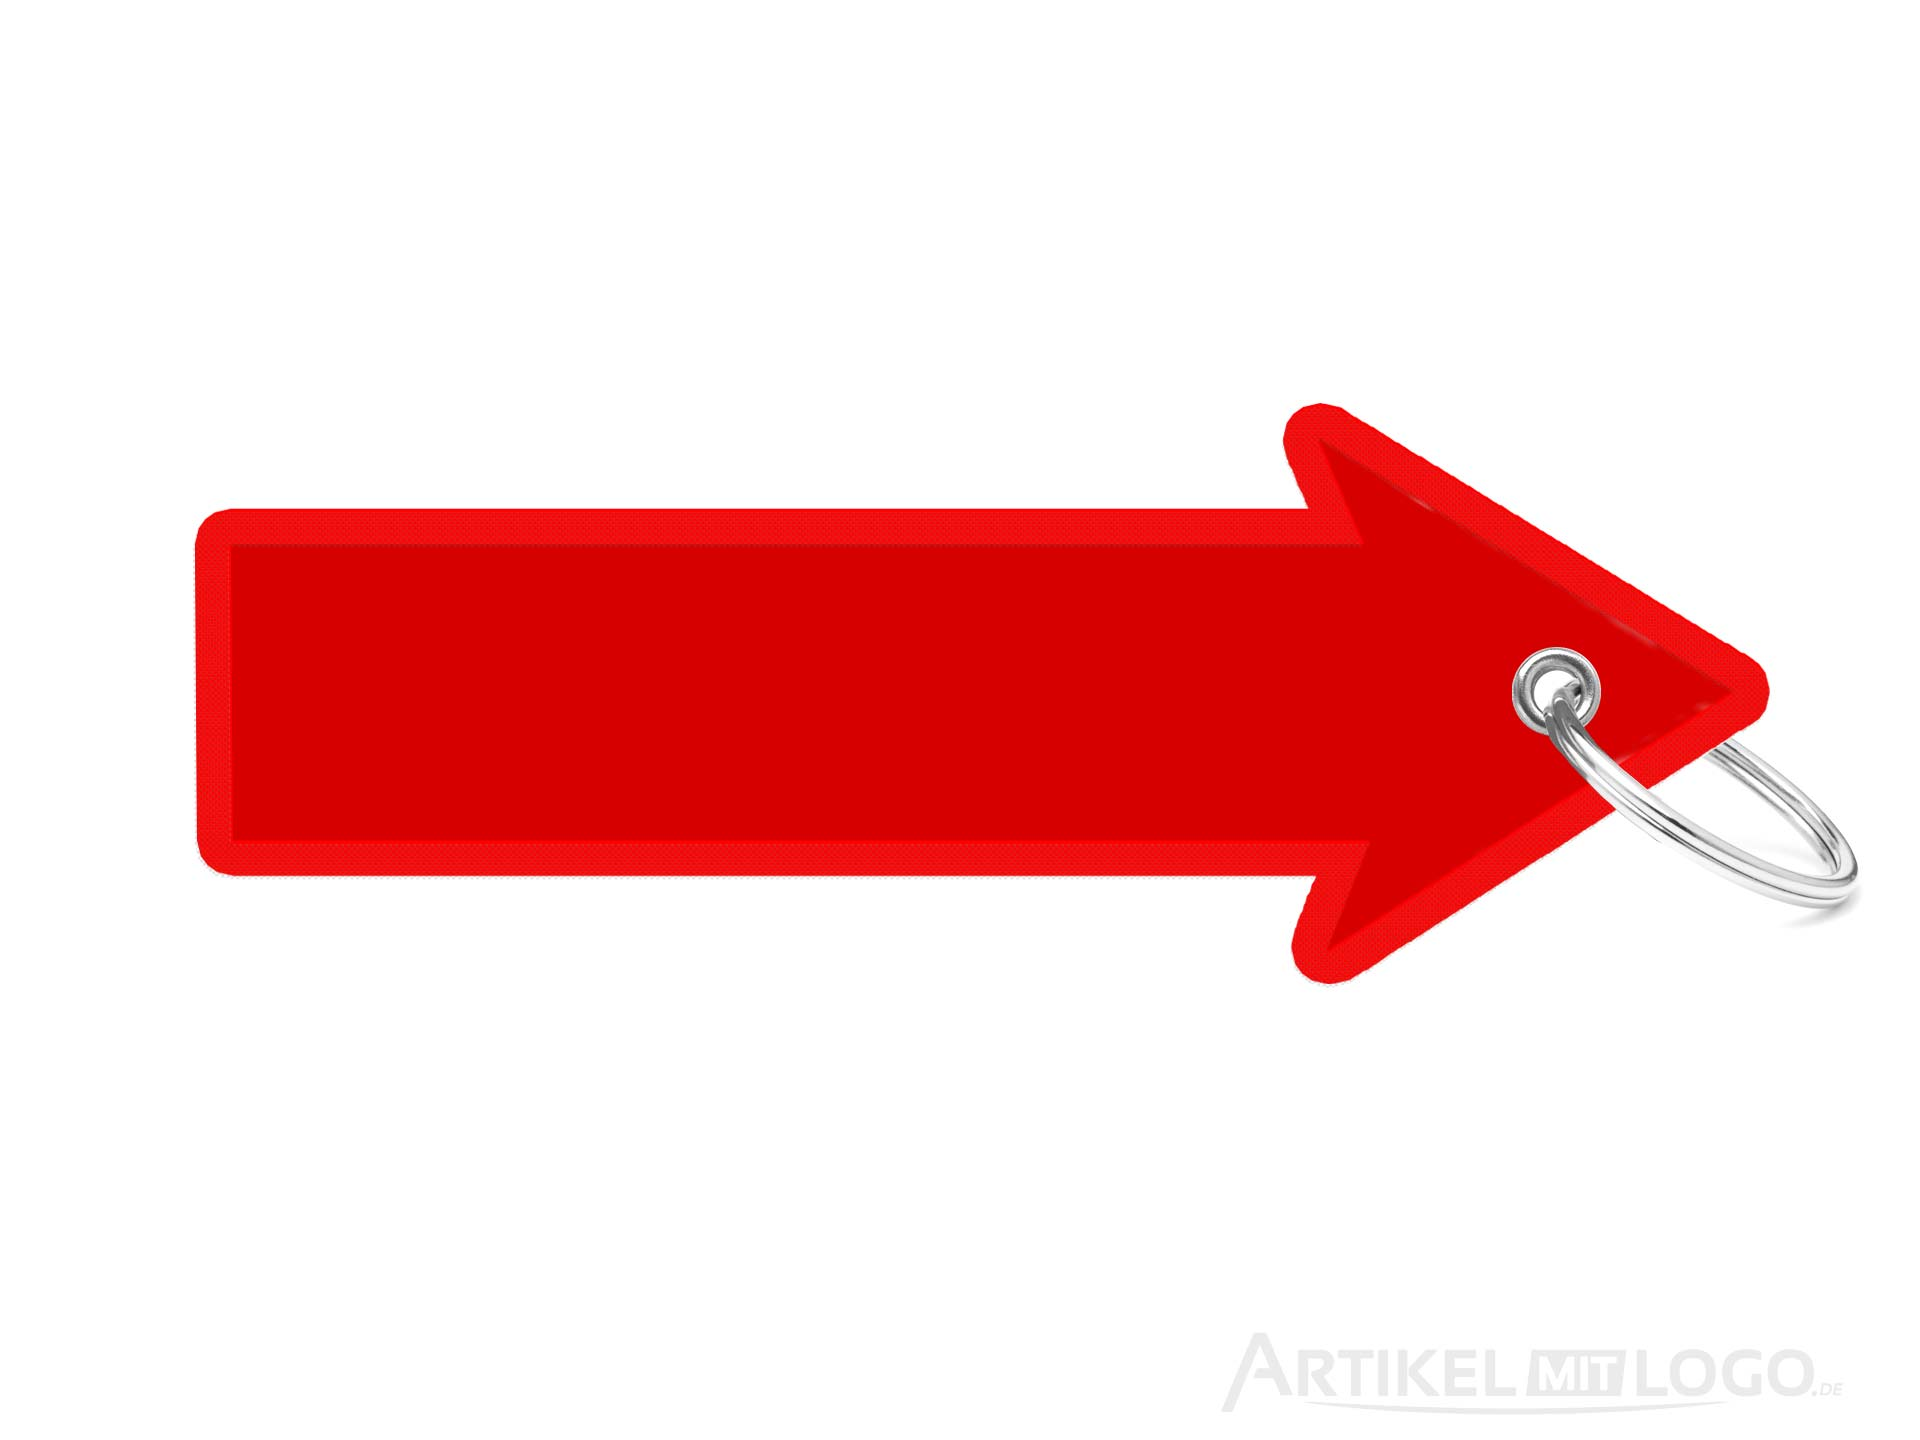 Pfeil-Form spitzer Schluesselanhaenger rot